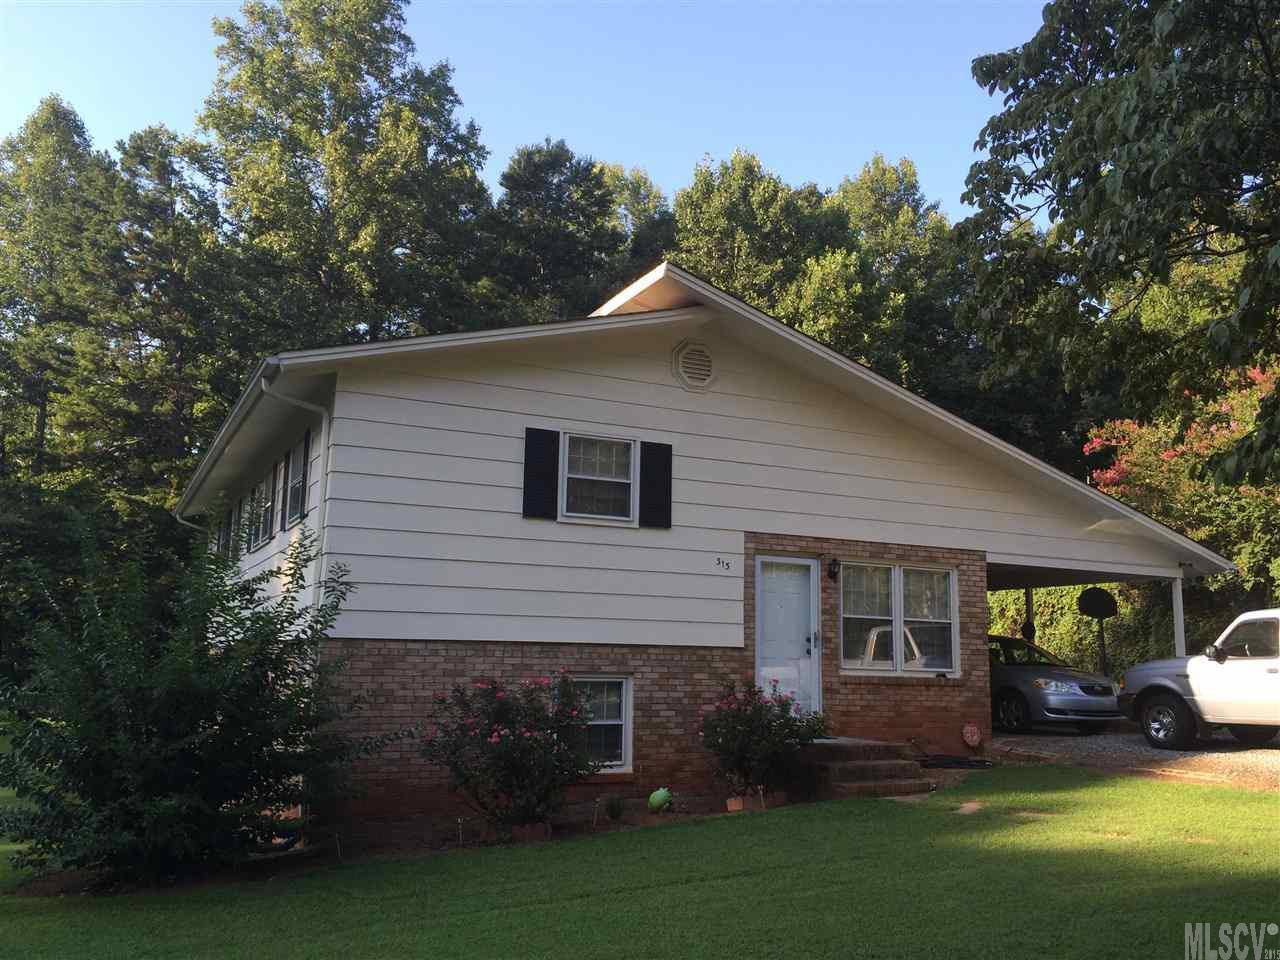 Real Estate for Sale, ListingId: 35105988, Conover,NC28613